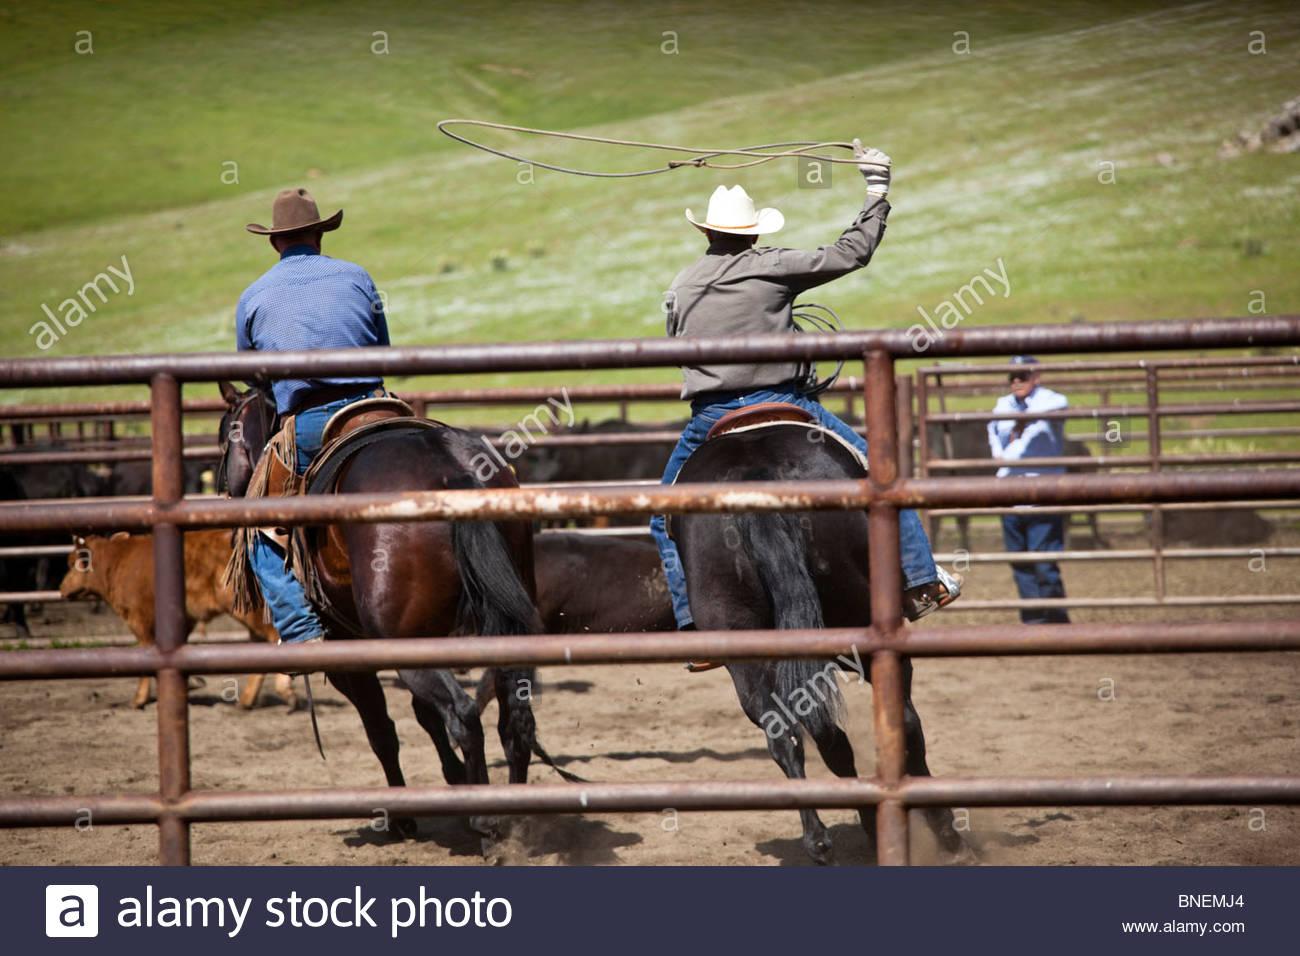 Cowboys Stock Photos Amp Cowboys Stock Images Alamy